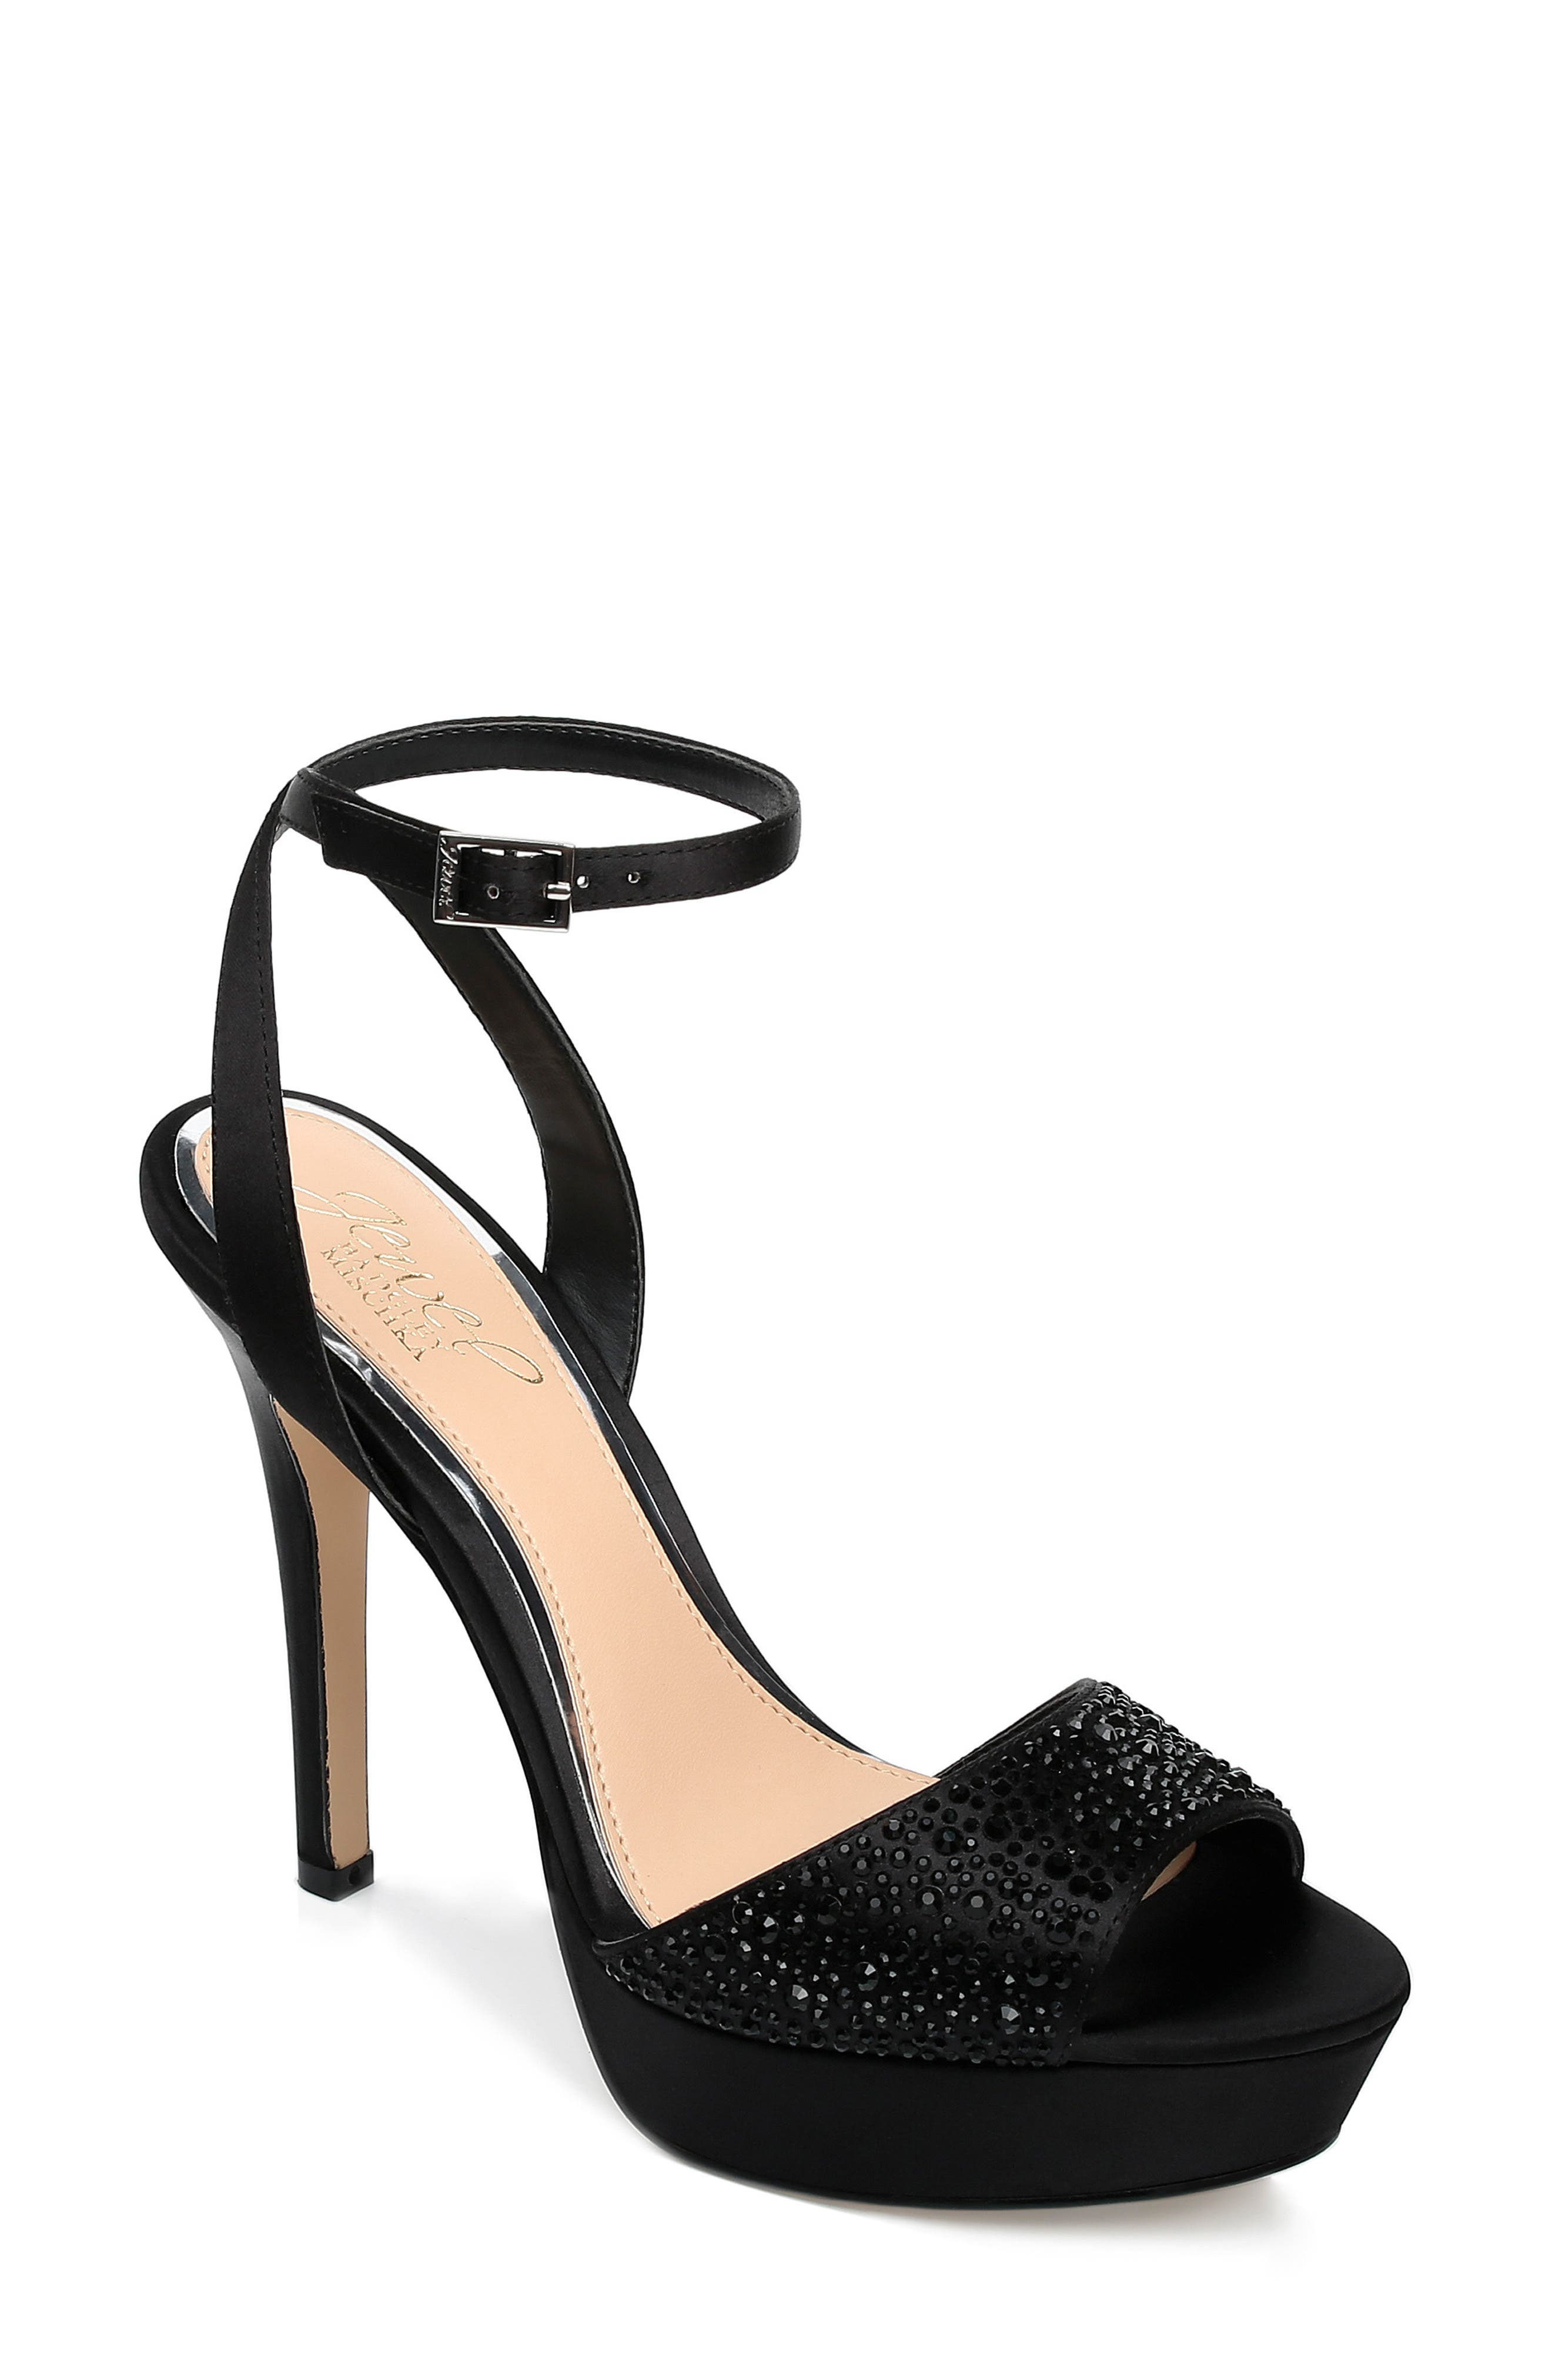 Jewel Badgley Mischka Milena Platform Sandal